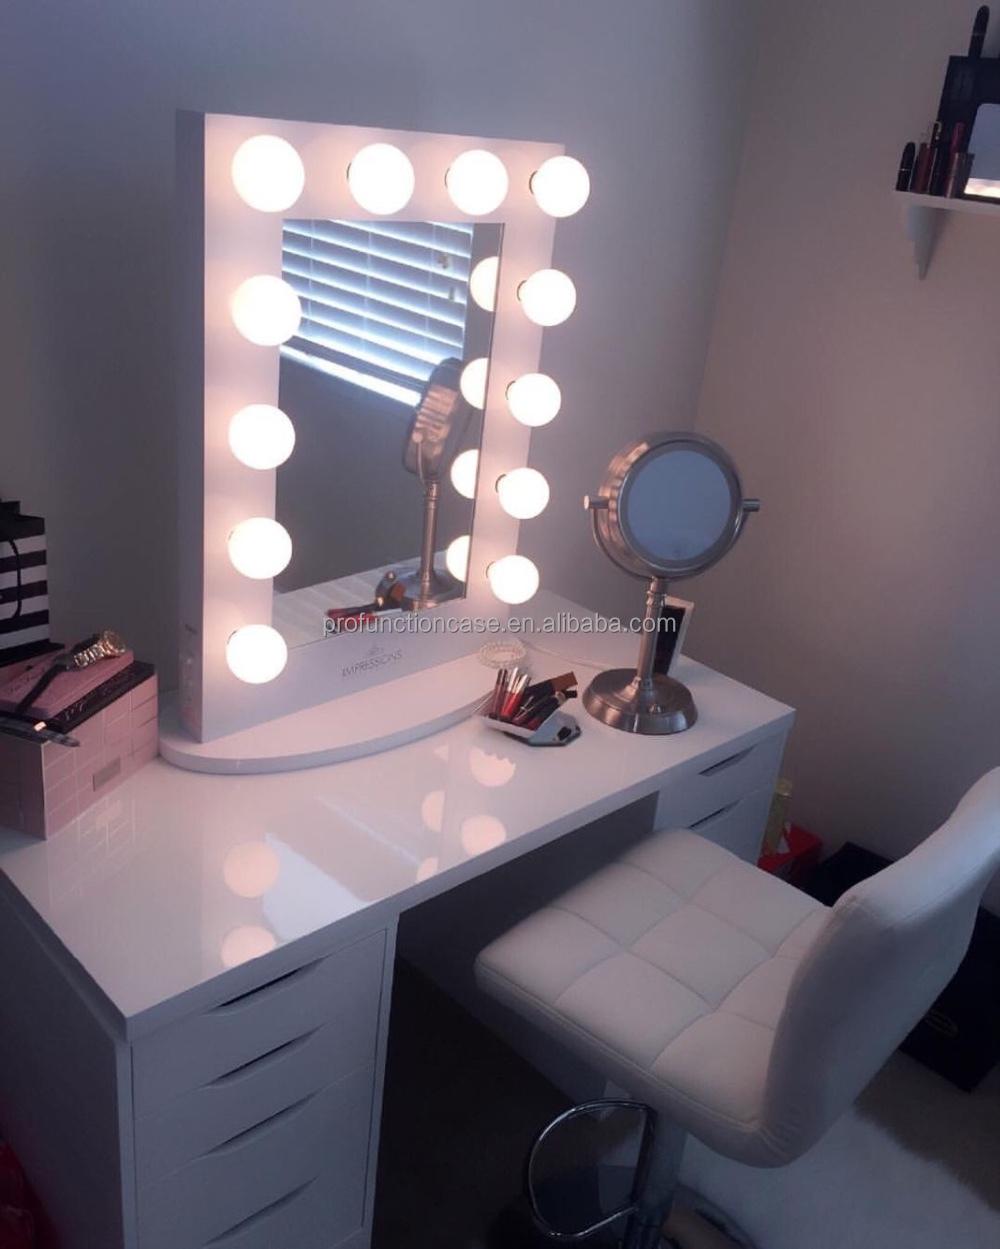 2016 Best Selling Led Lighted Makeup Mirror Hollywood Lighted Make ...